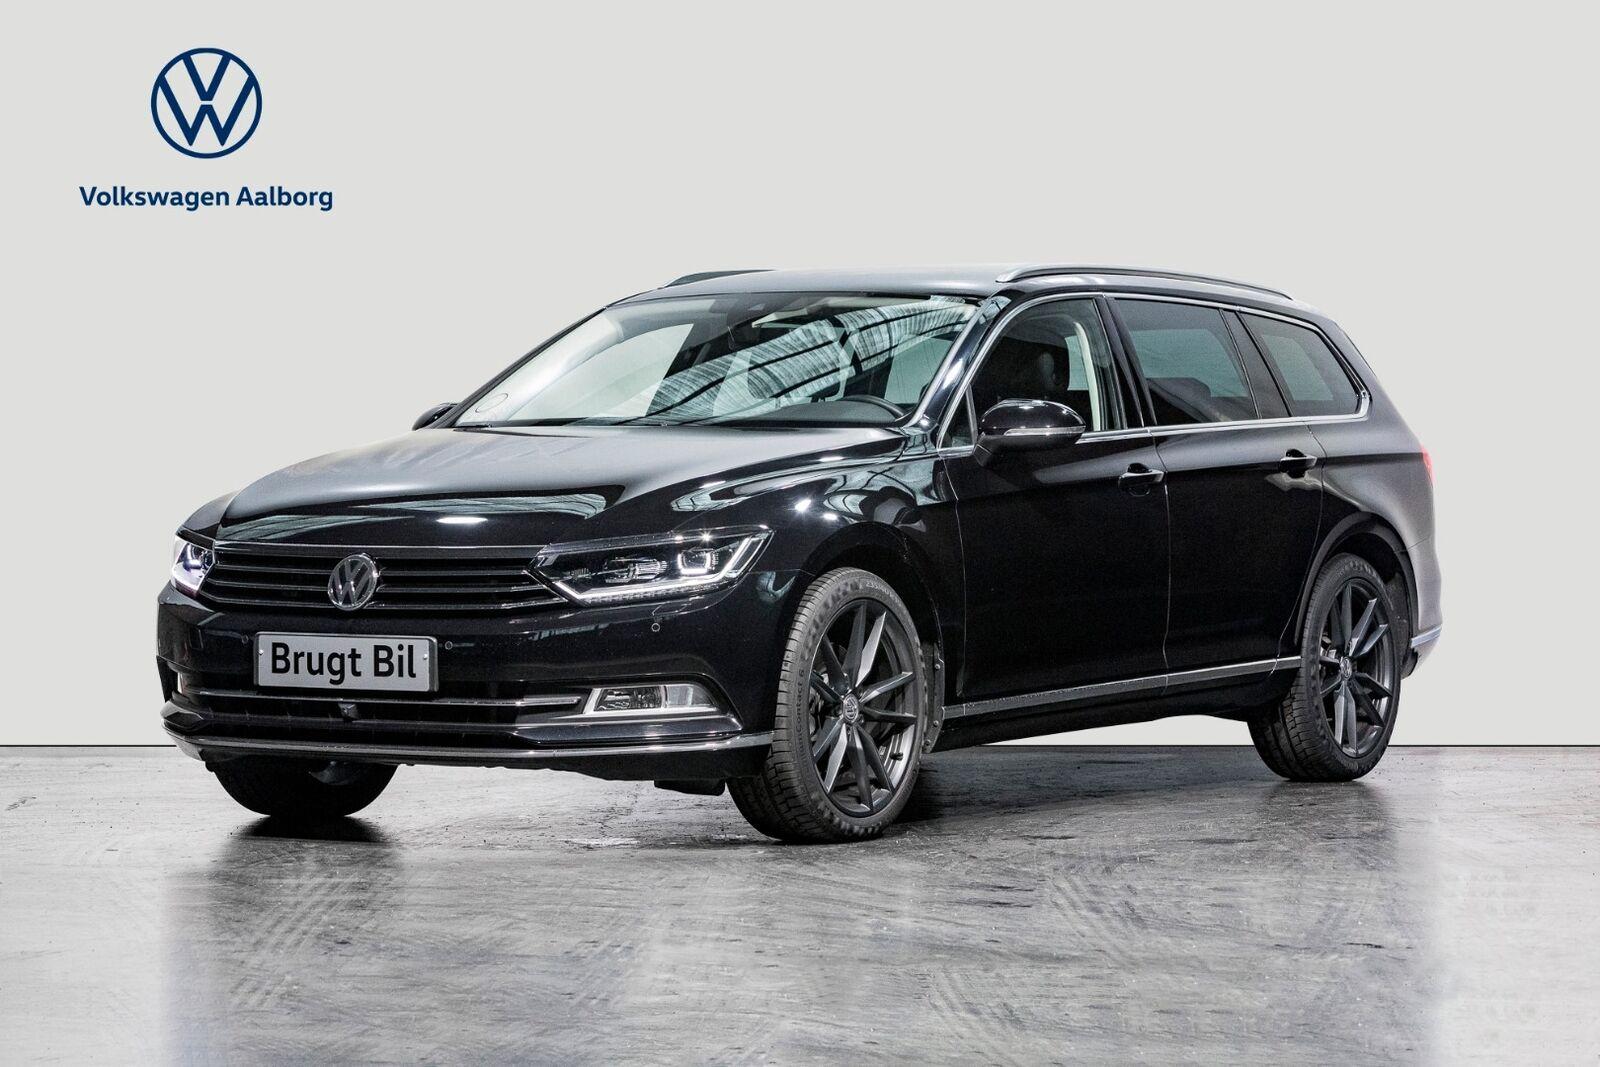 VW Passat 1,8 TSi 180 Highl. Prem. Vari. DSG 5d - 374.900 kr.